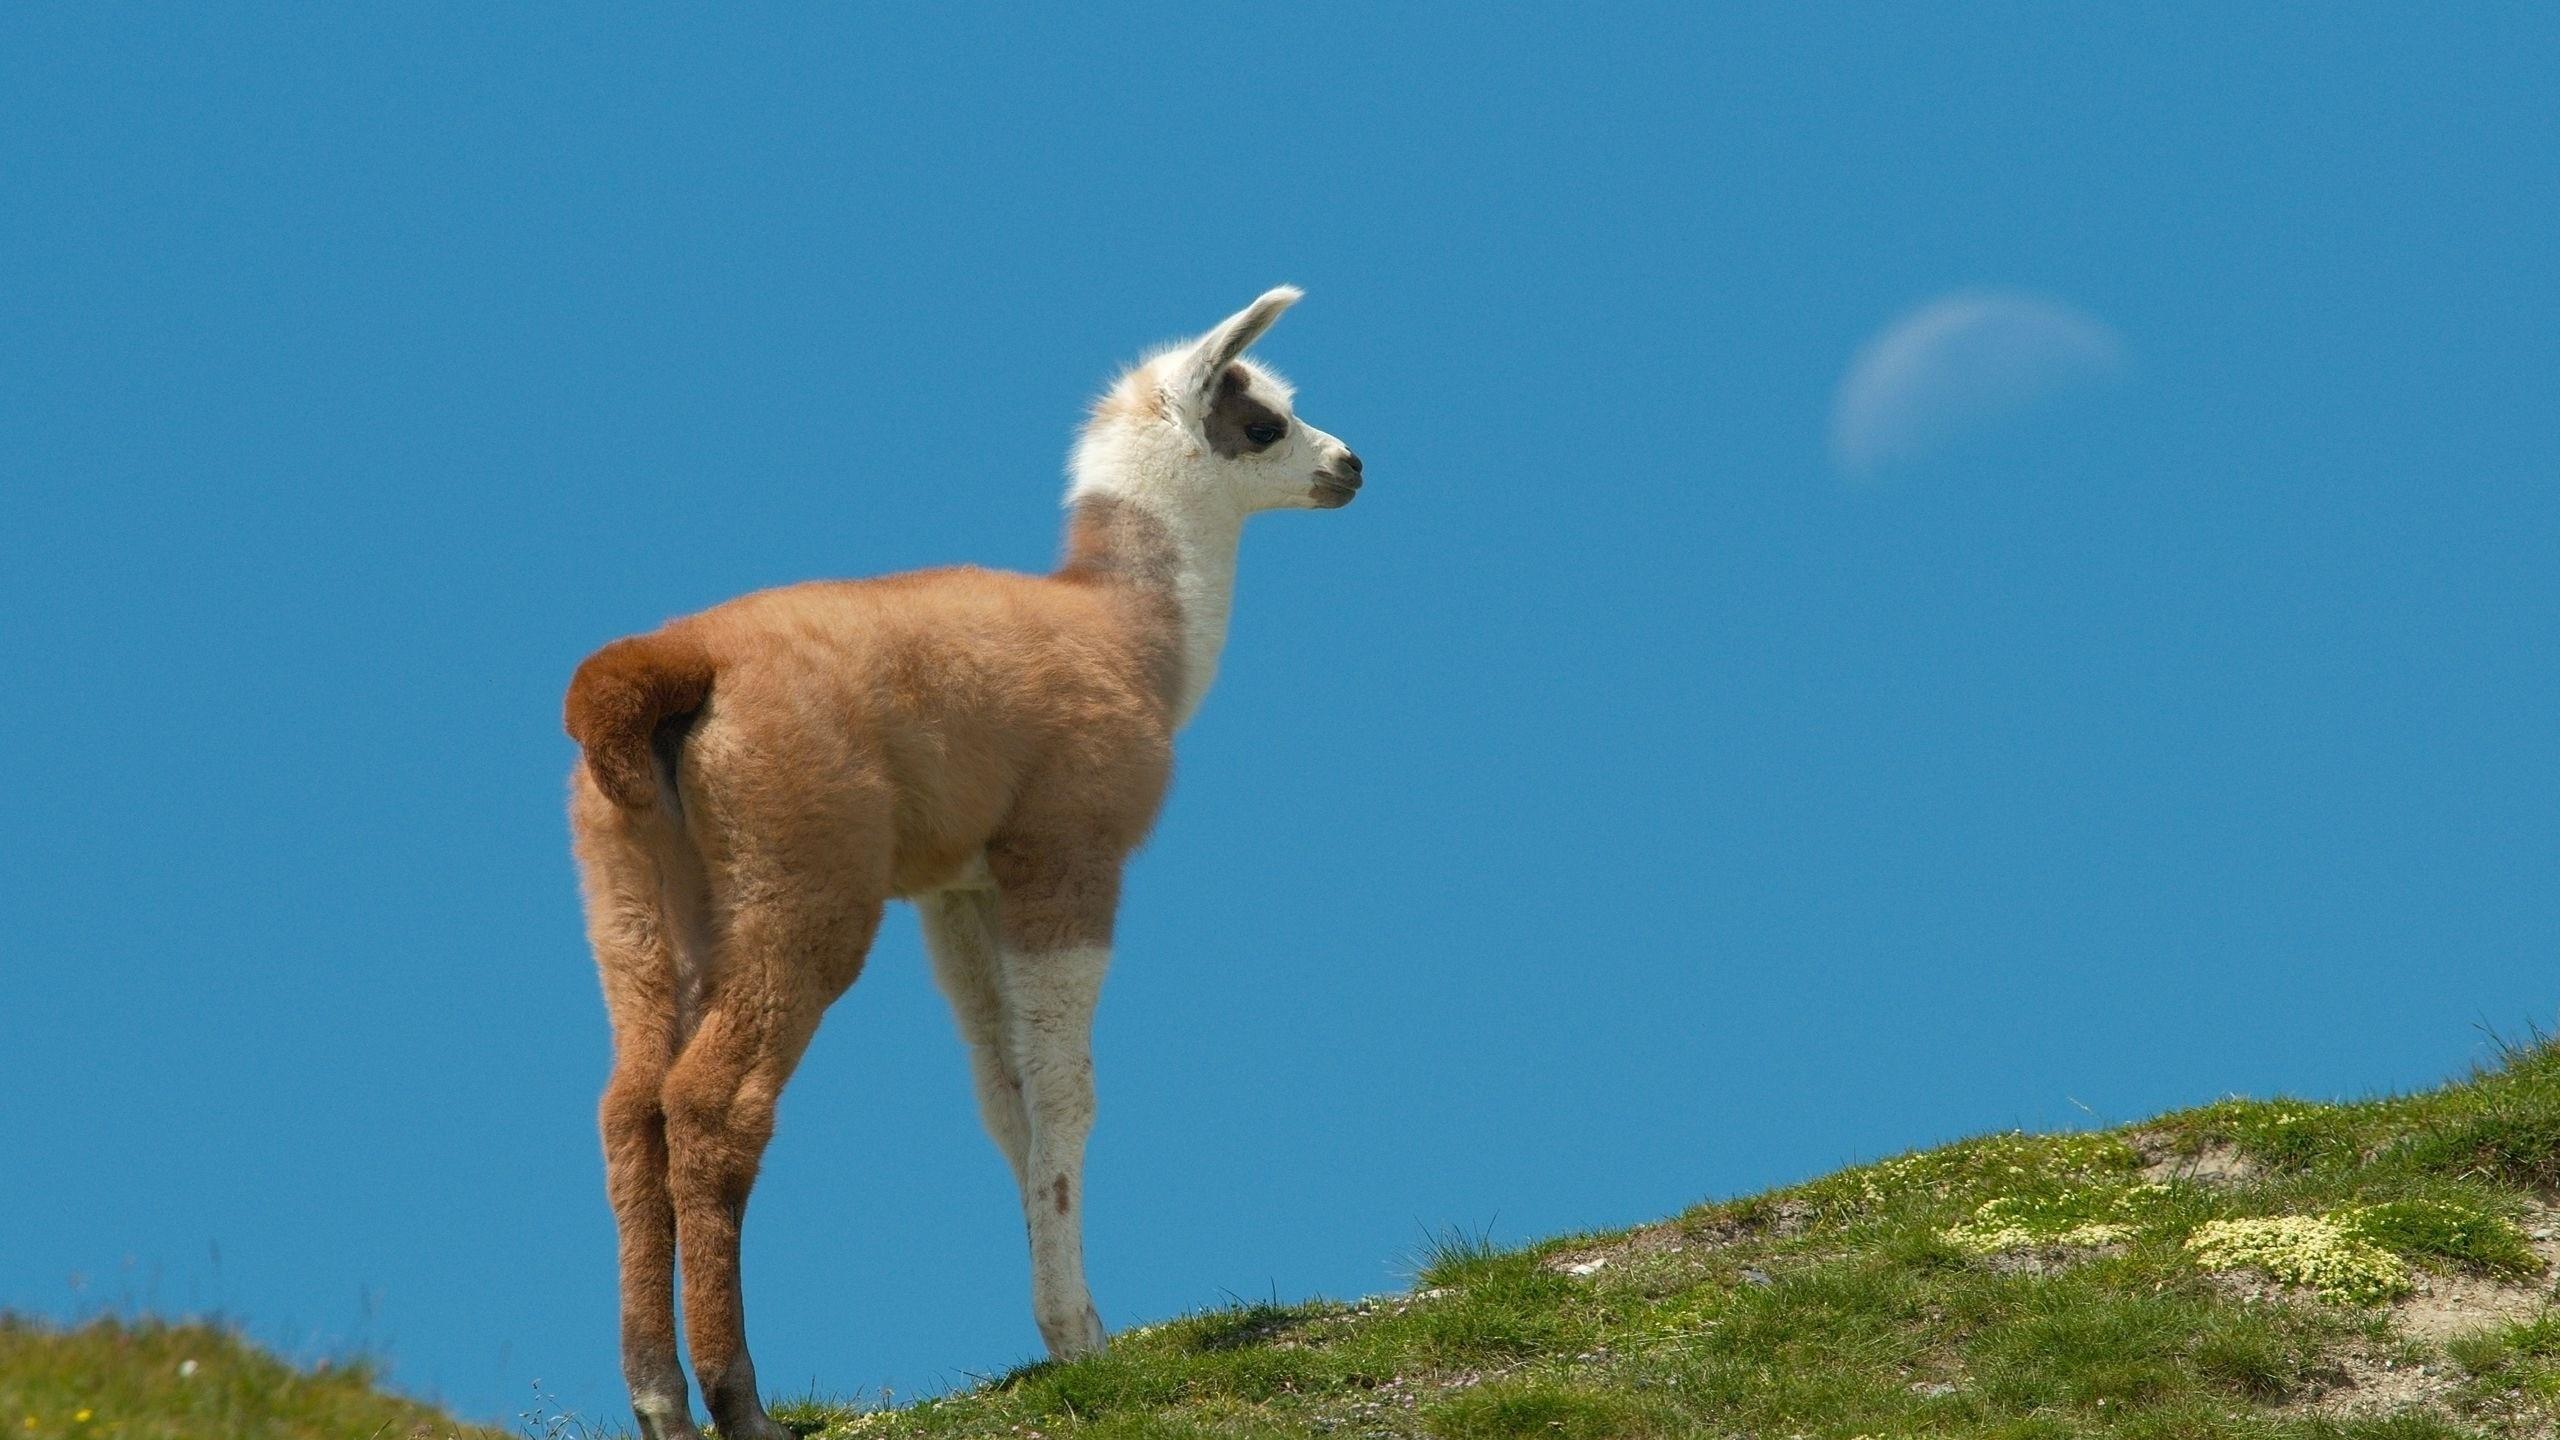 2048x1152 Wallpaper Alpaca Muzzle Cute